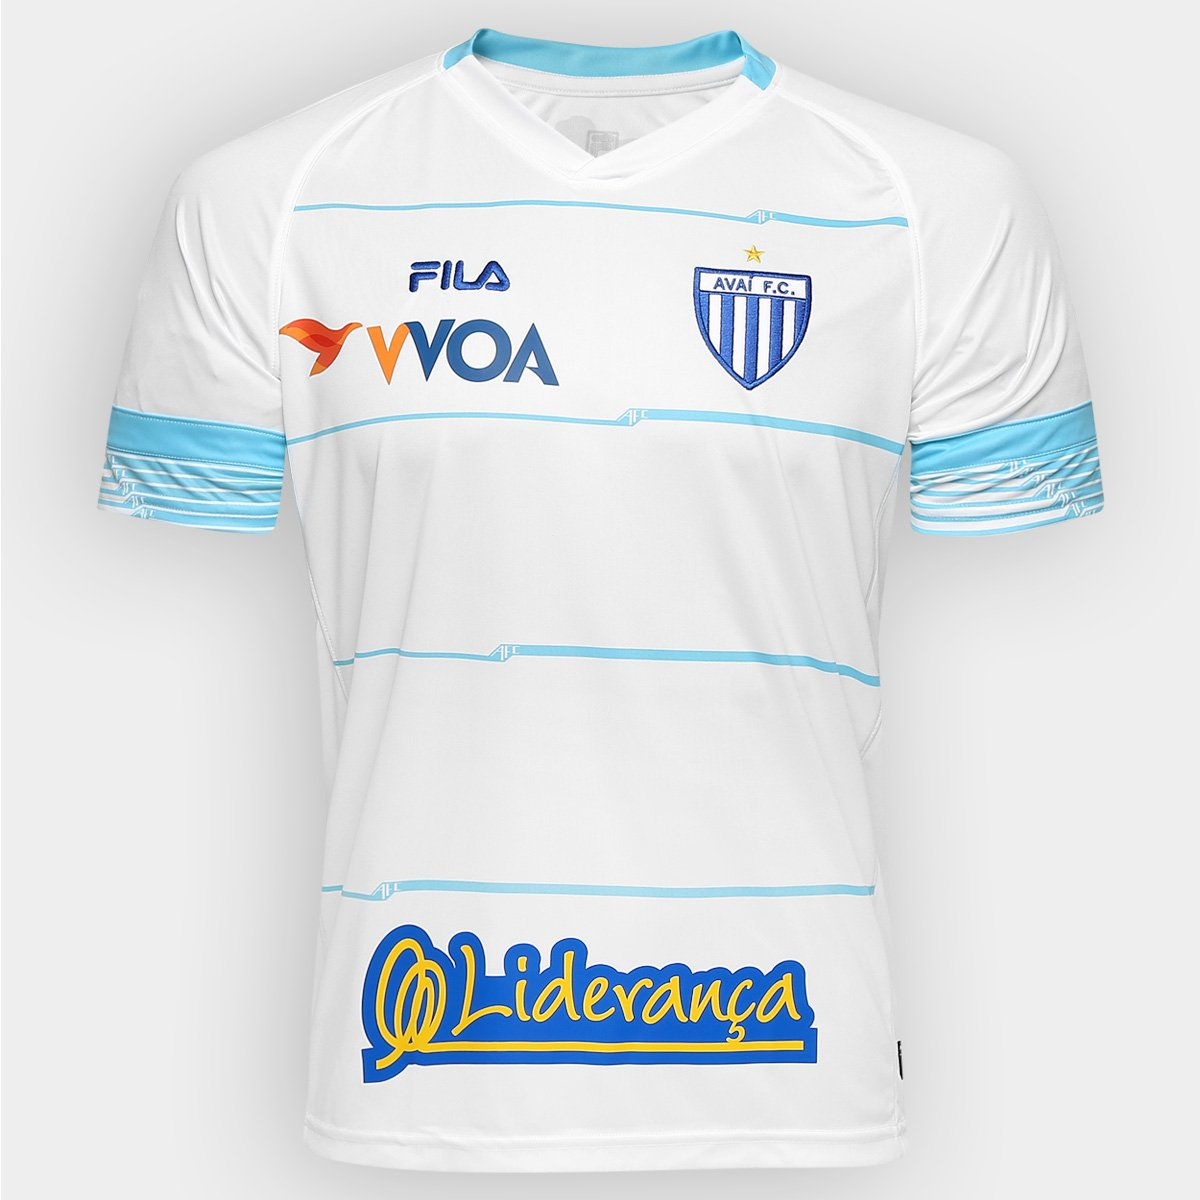 e590800b97 Camisa Avaí II 2016 s nº Torcedor Fila Masculina - Compre Agora ...